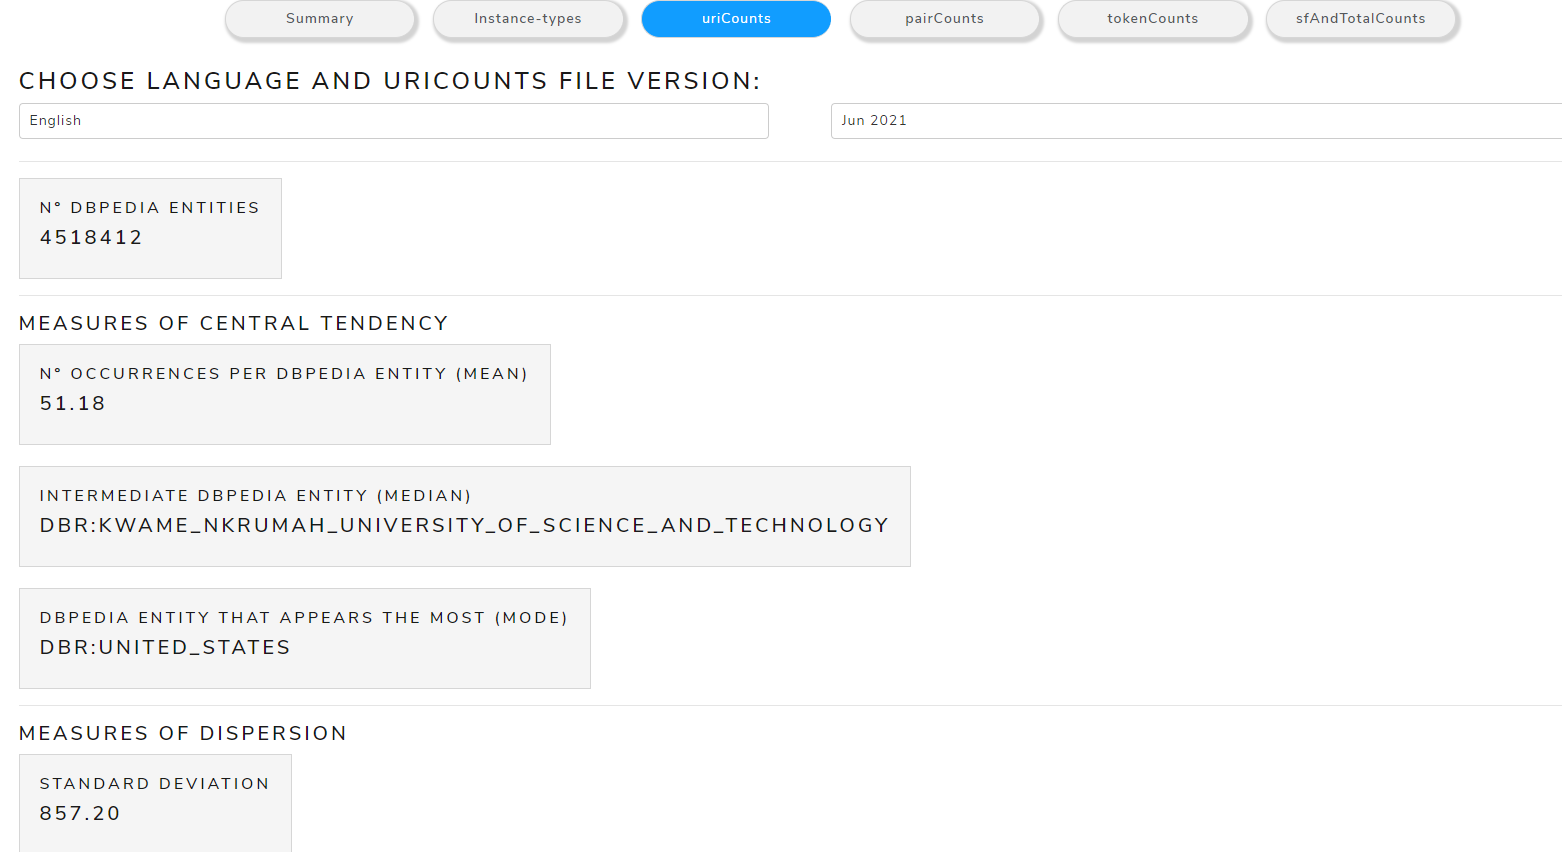 uriCounts